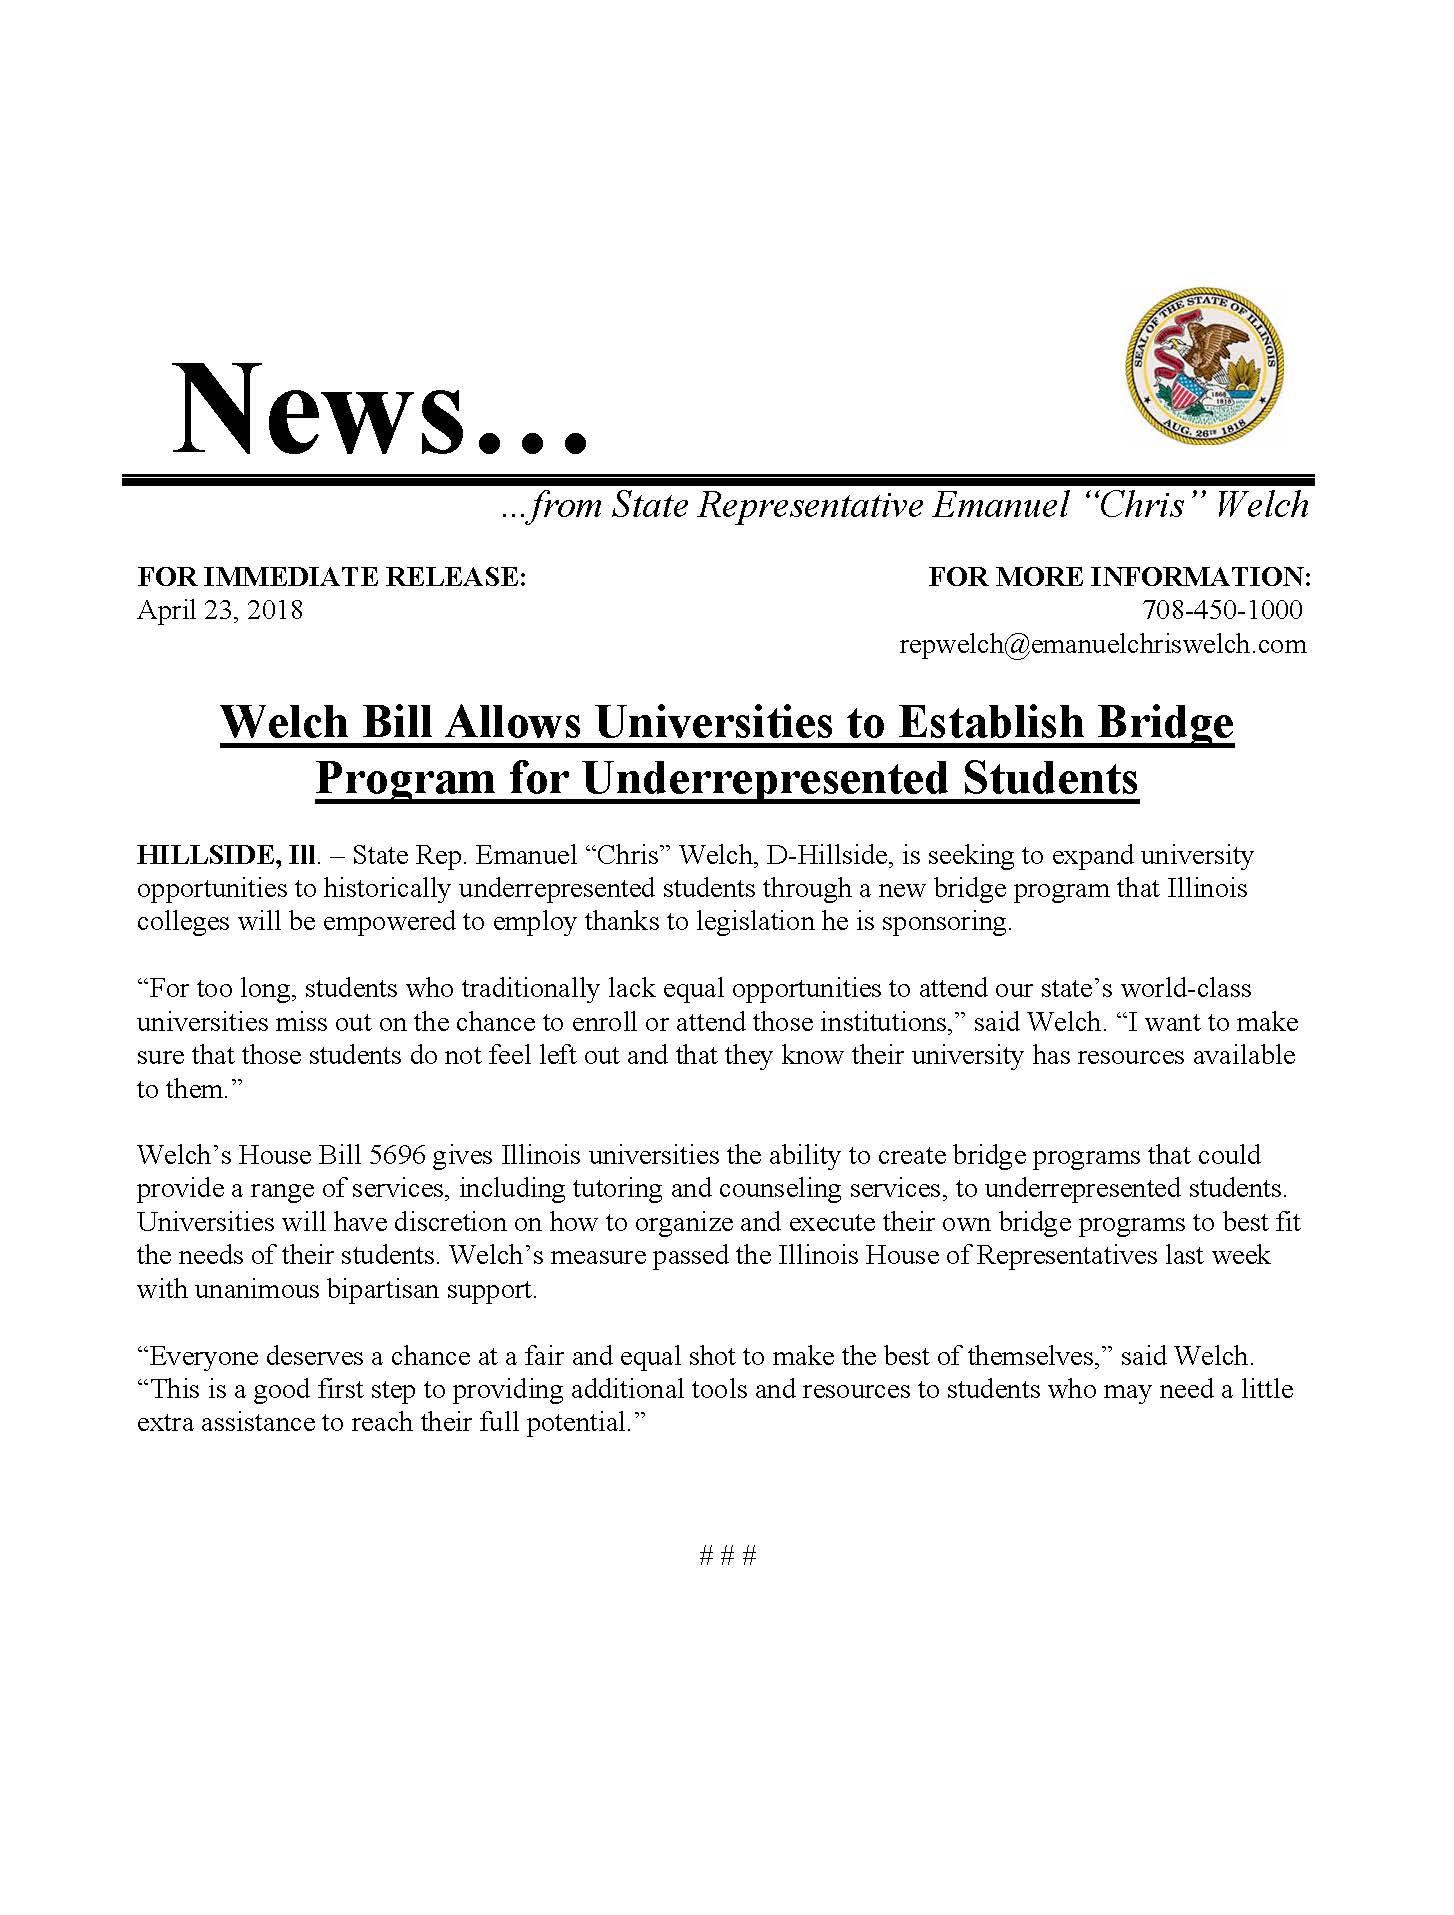 Welch Bill Allows Universities to Establish Bridge Program for Underrepresented Students  (April 23, 2018)